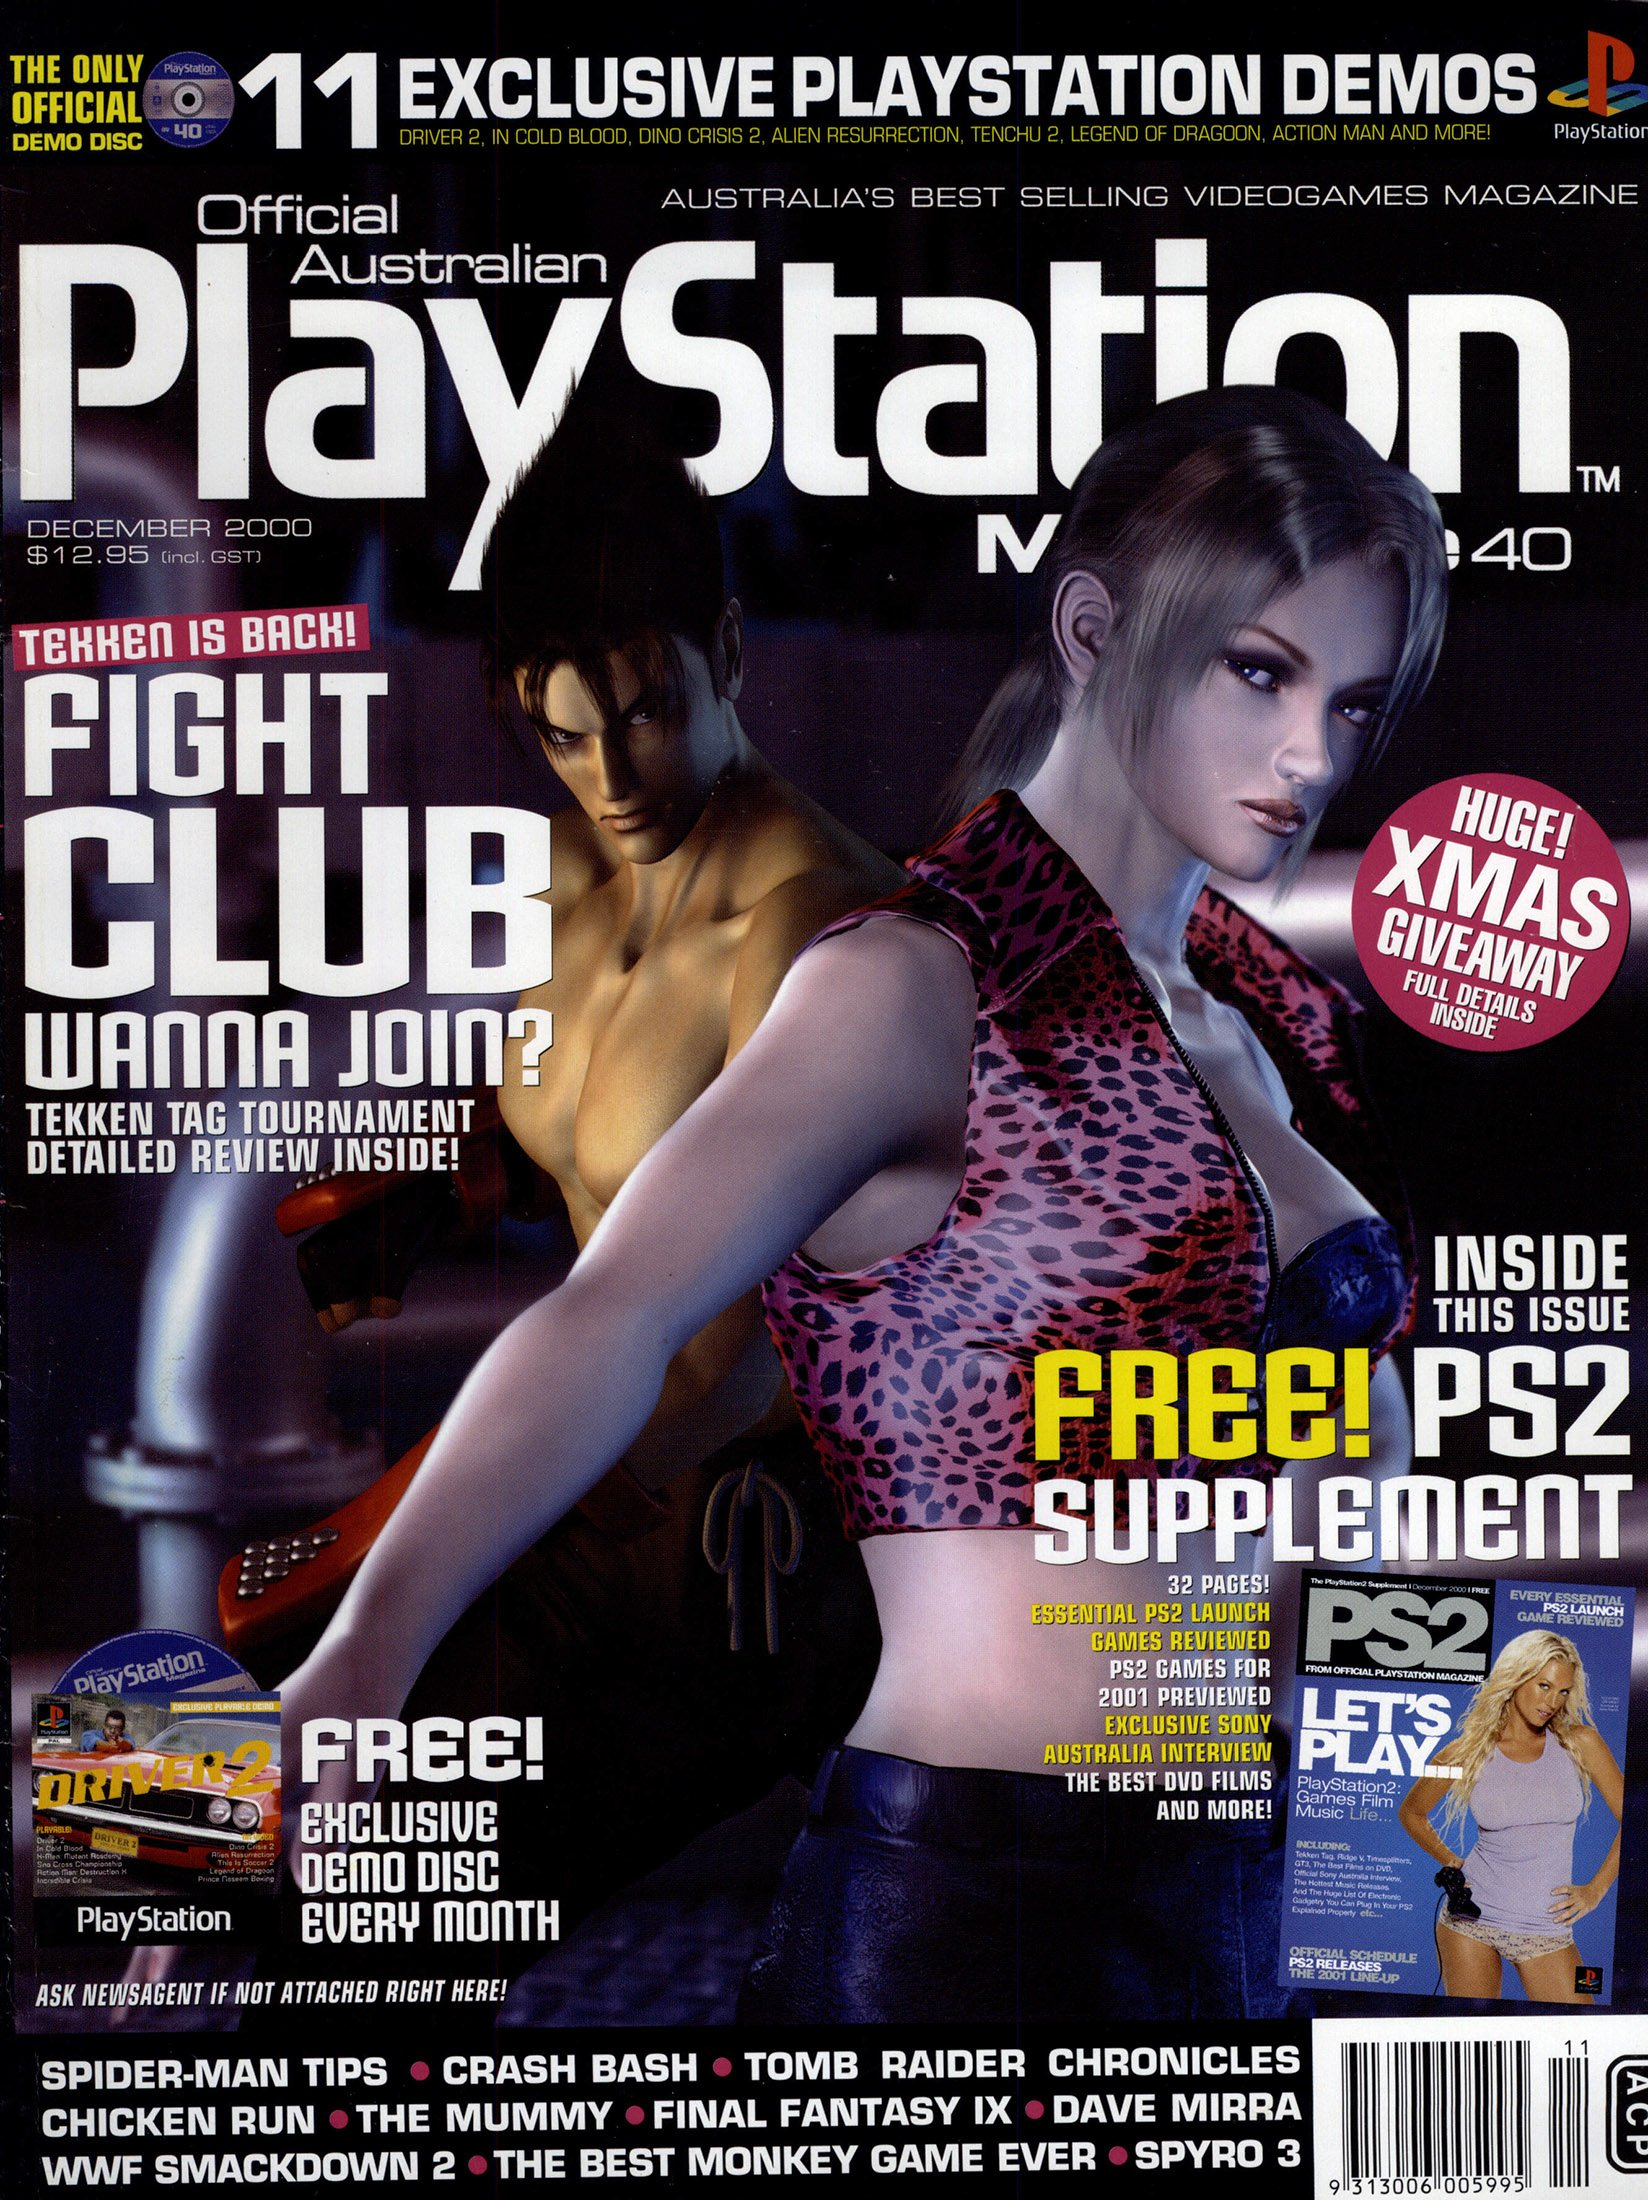 Official Australian PlayStation Magazine 040 (December 2000)